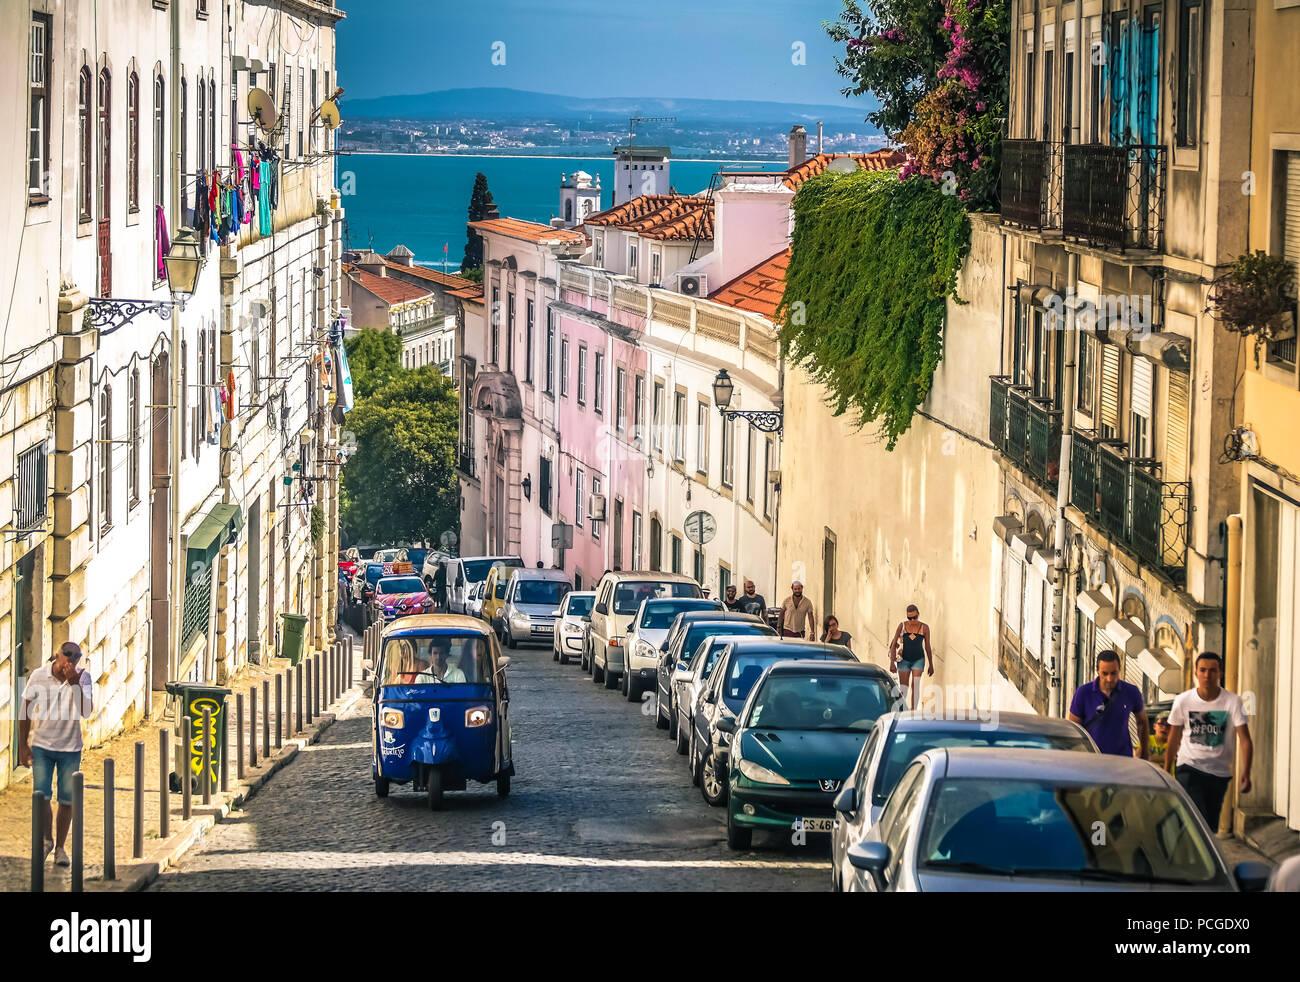 Lisboa. Un tuk-tuk de la primera generación sube en Graça. Imagen De Stock